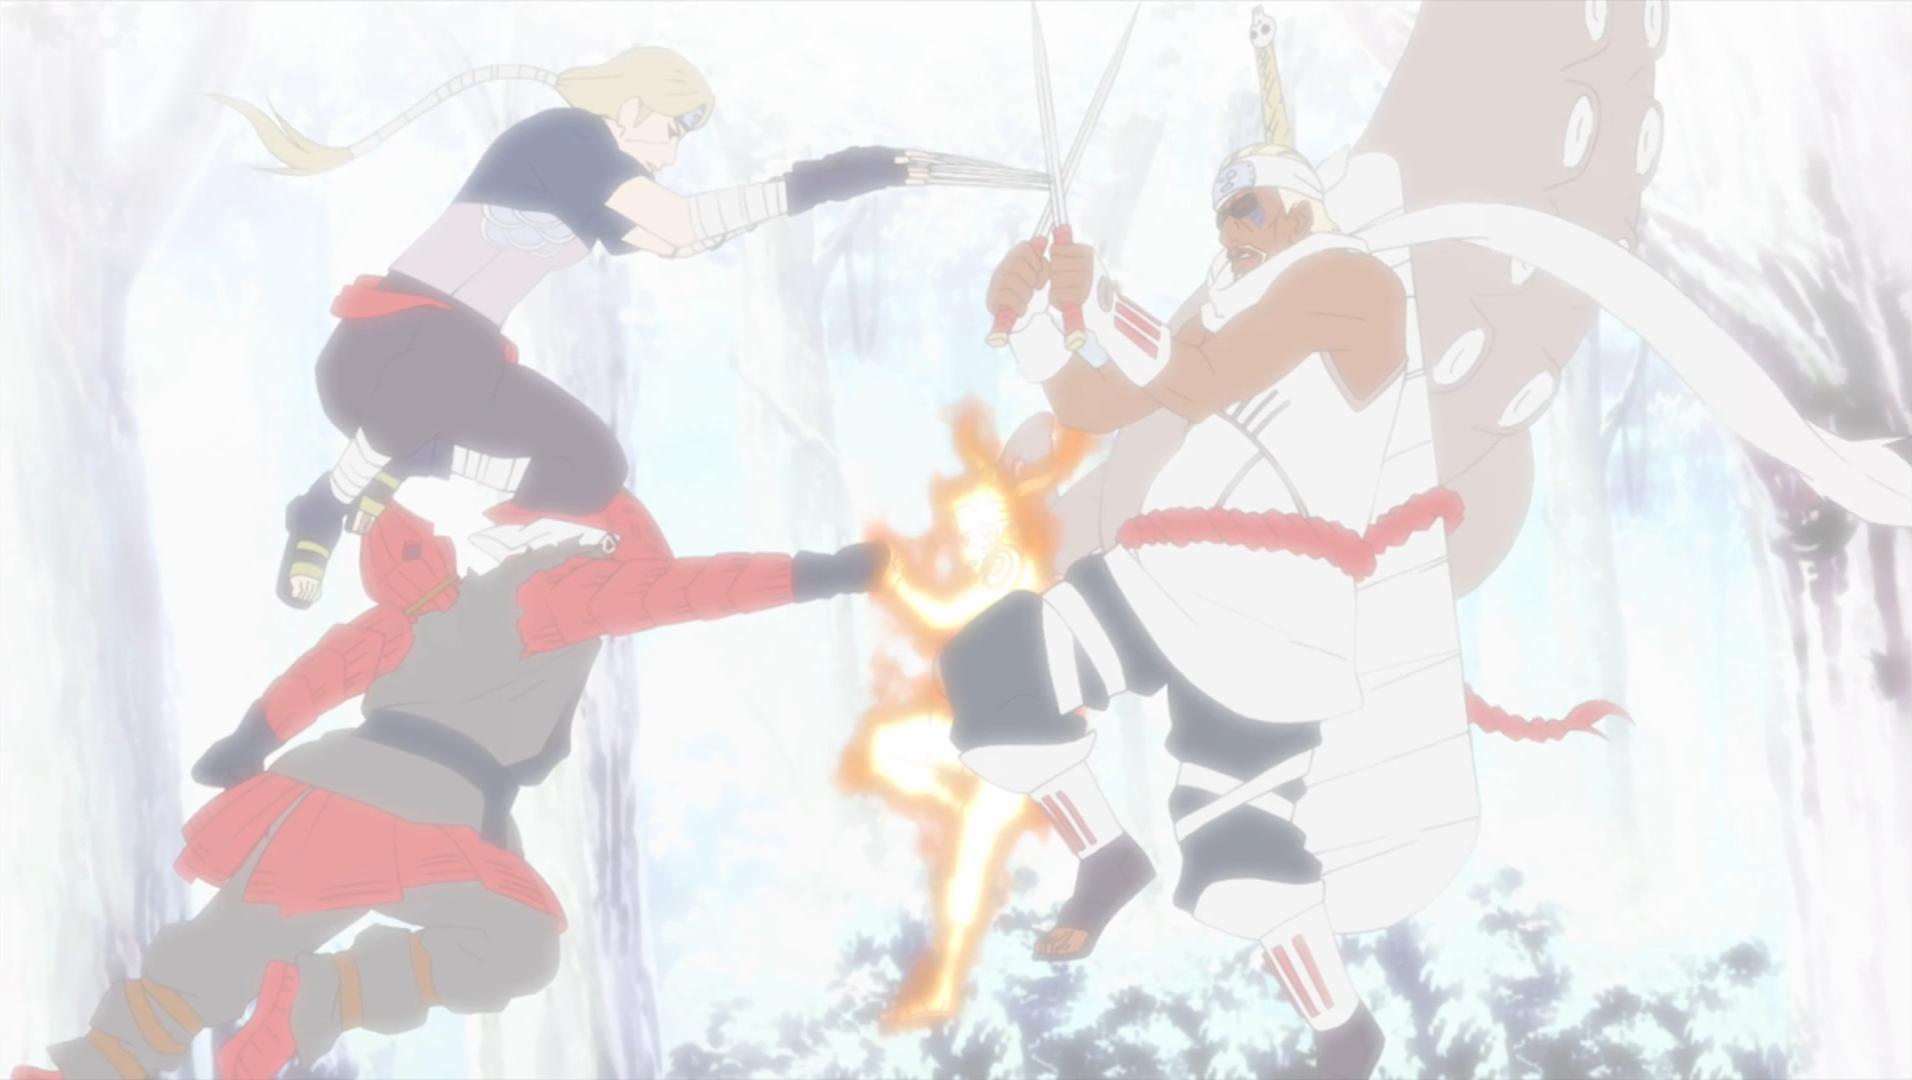 Han | Narutopedia | FANDOM powered by Wikia